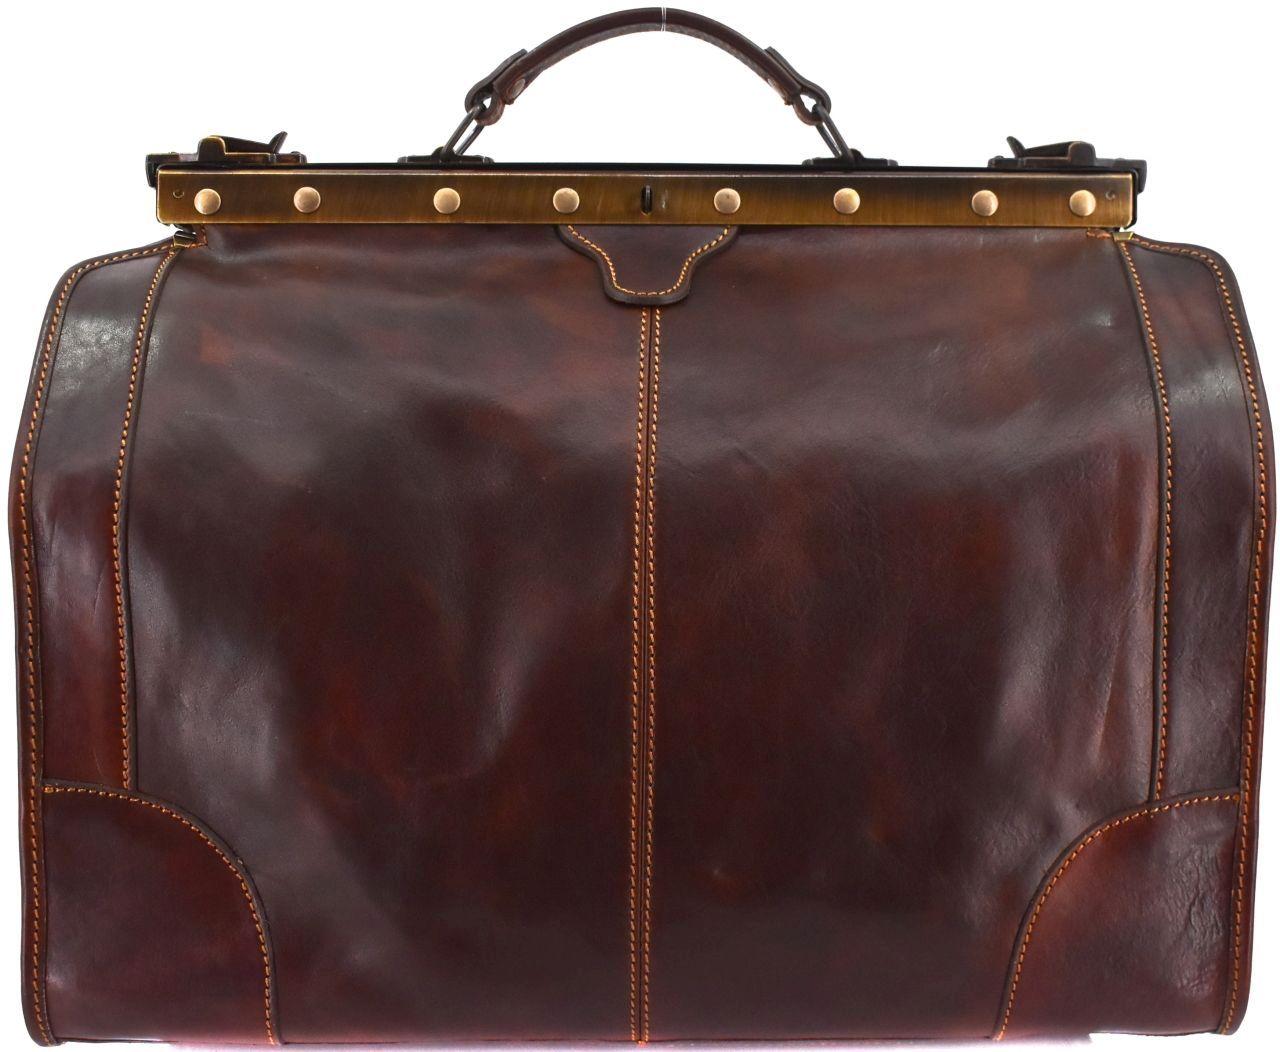 Kožená doktorská taška Arteddy - tmavě hnědá